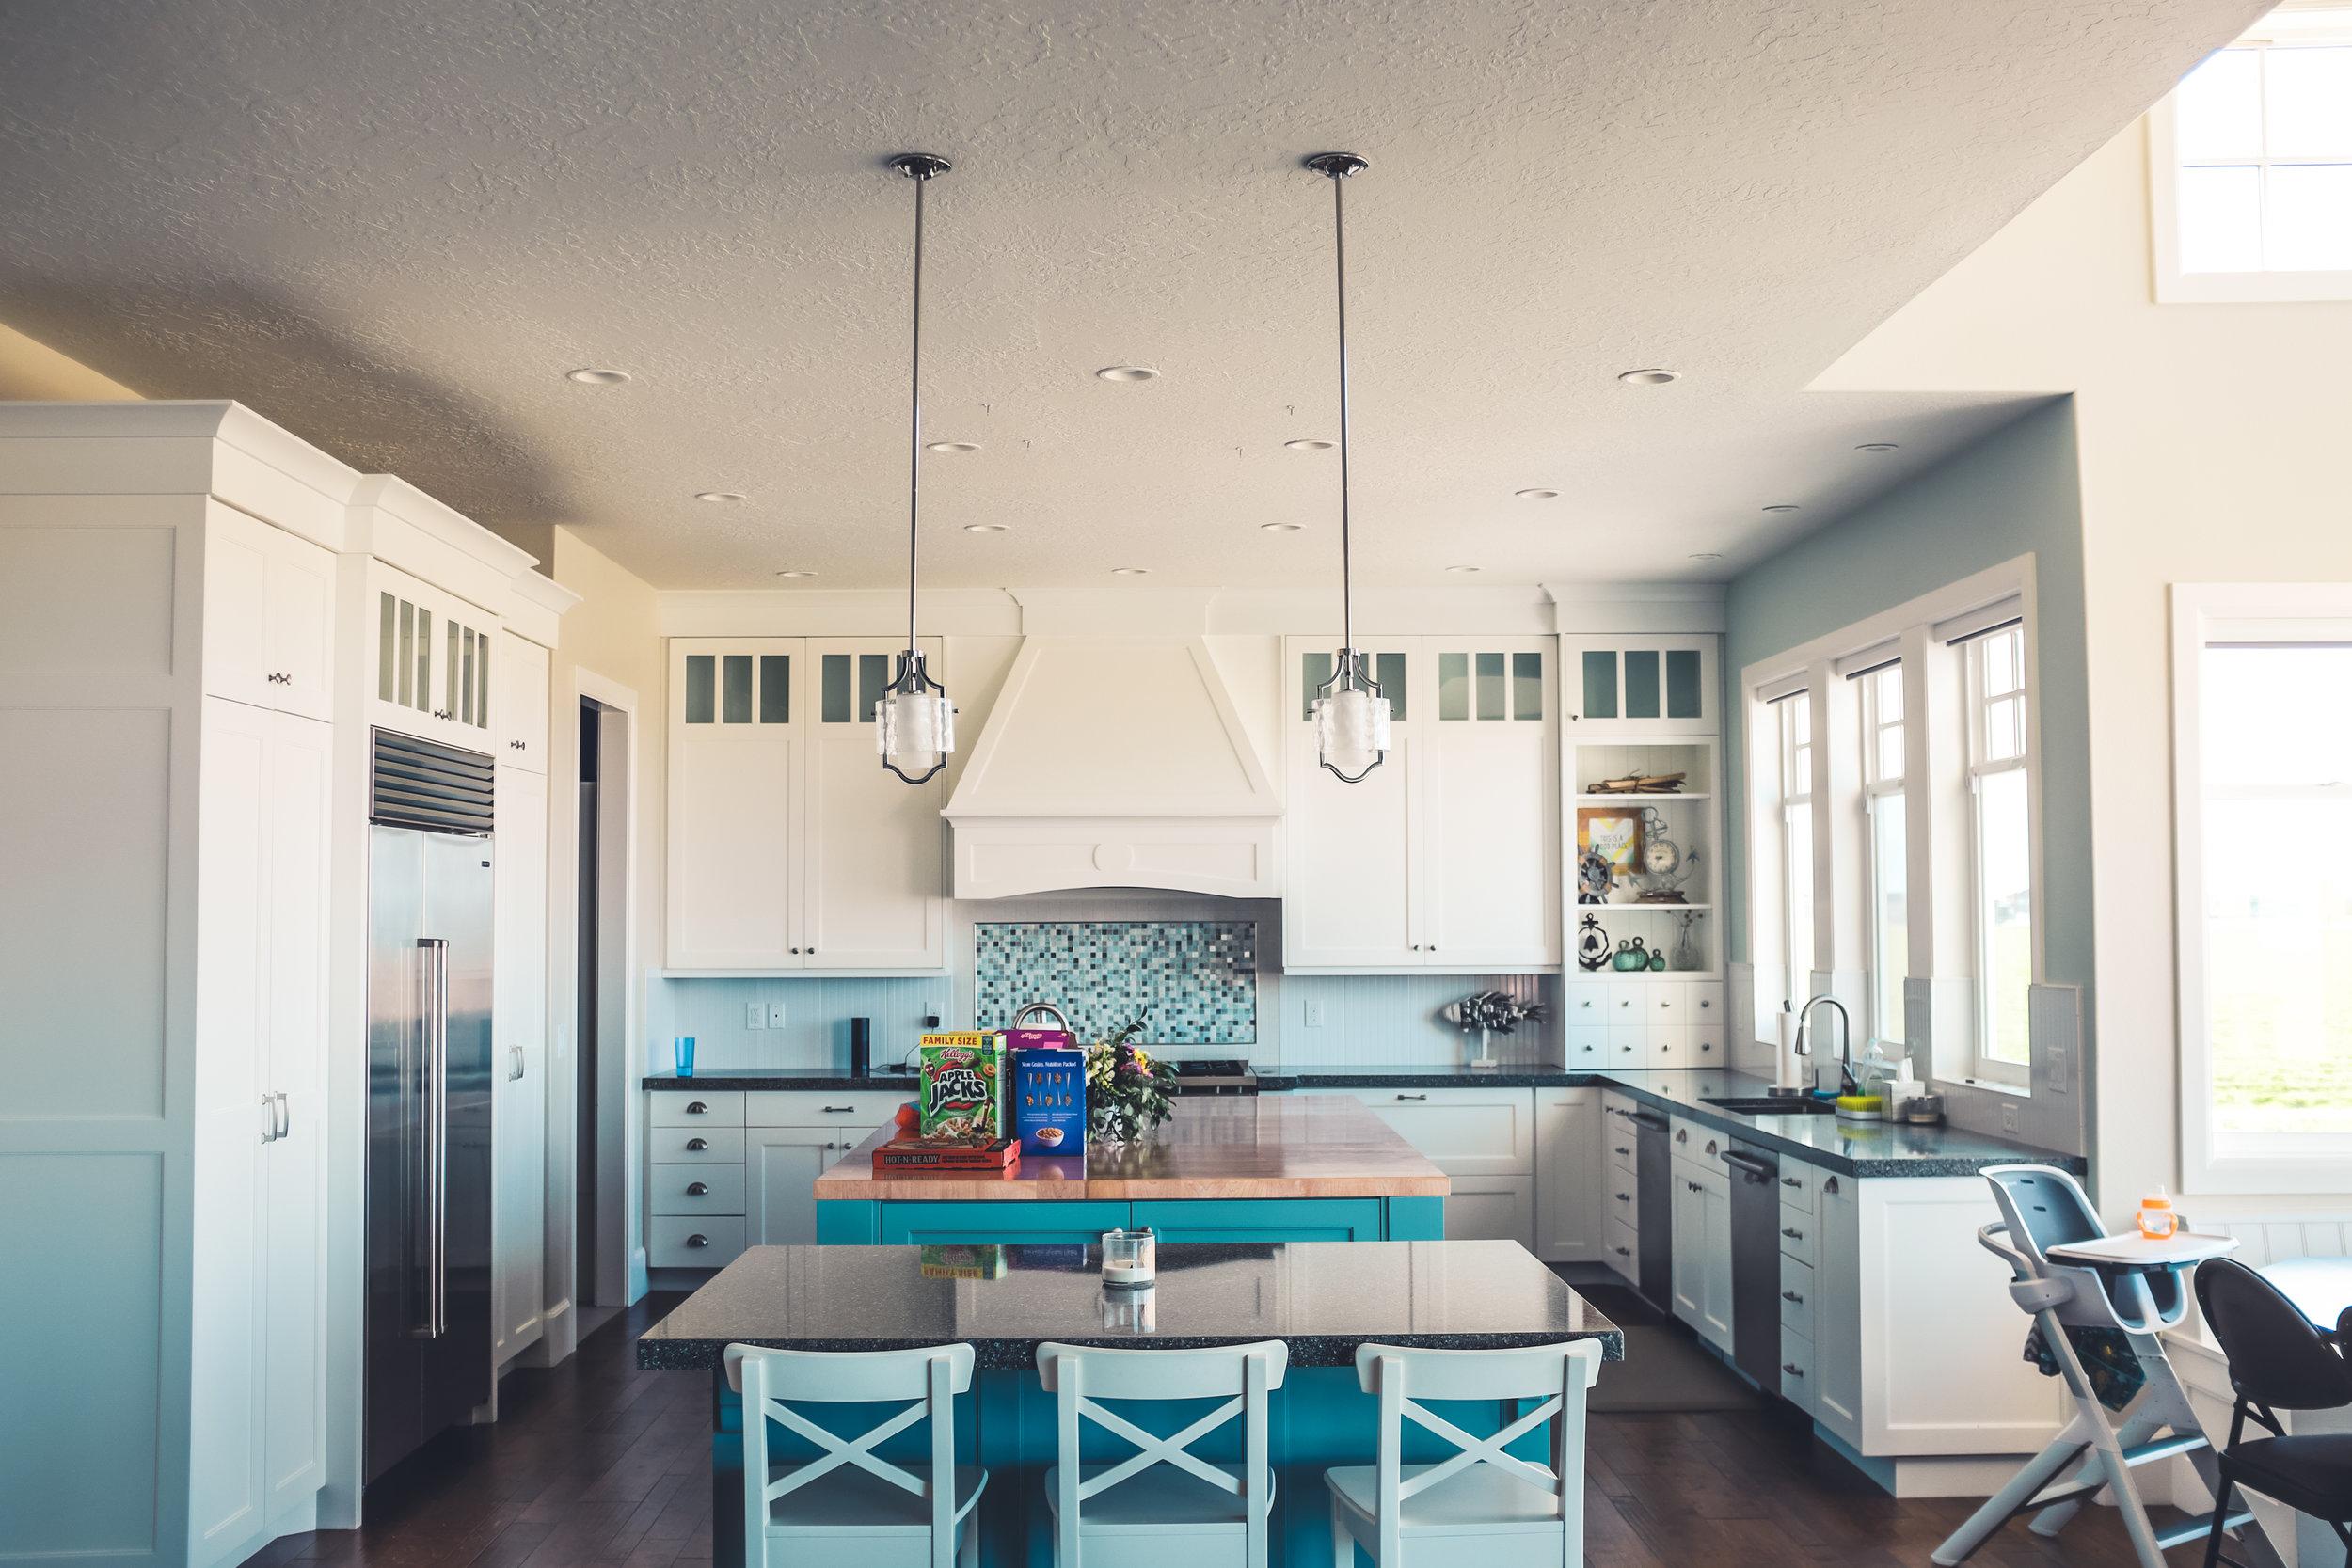 sell-home-house-cincinnati-mason-kenwood-hyde-park-sibcy-cline-patrick-lach